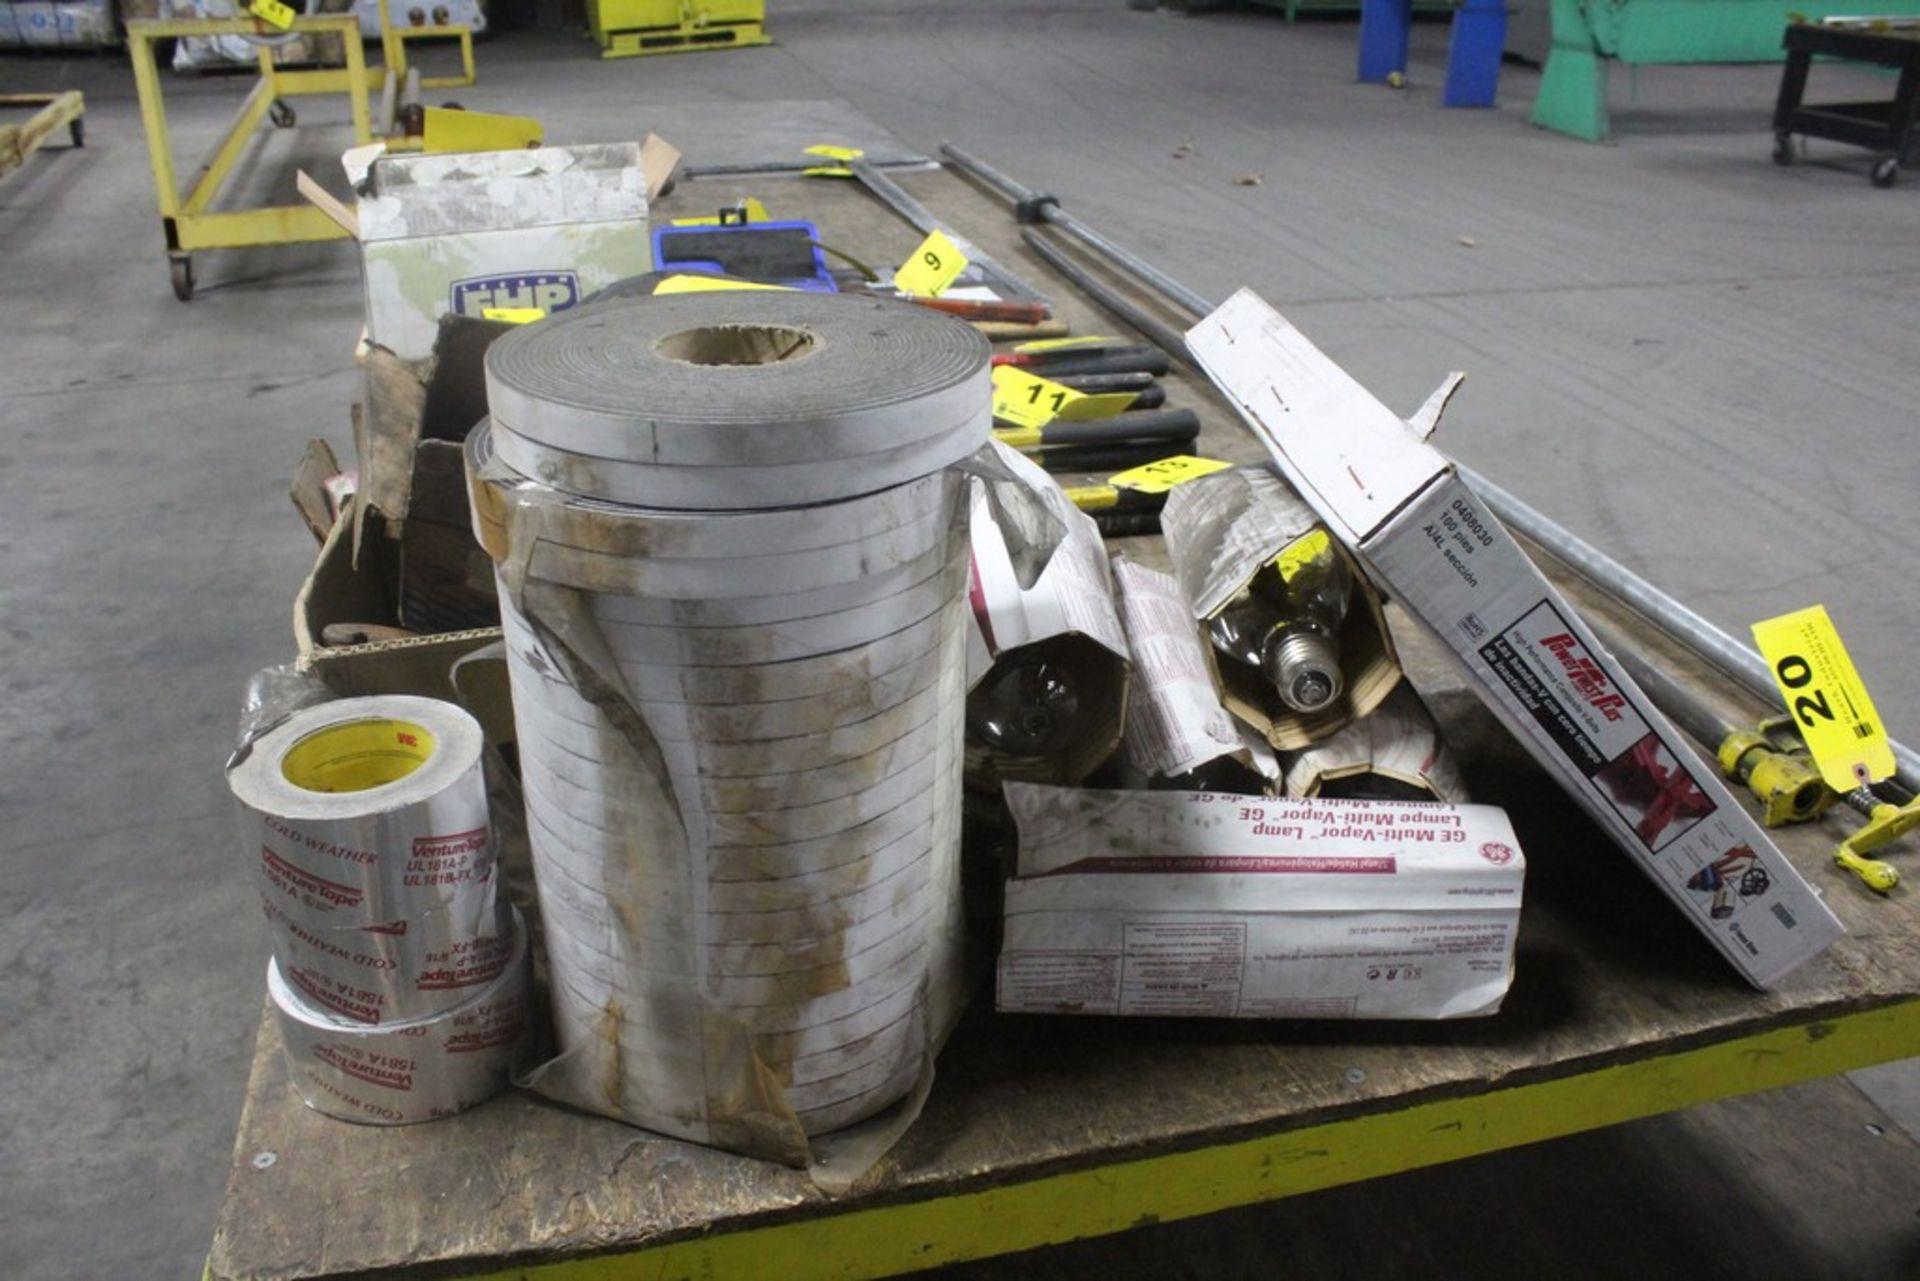 Lot 18 - Lot: Miscellaneous: Electrical - Belts - Plumbing - Tape